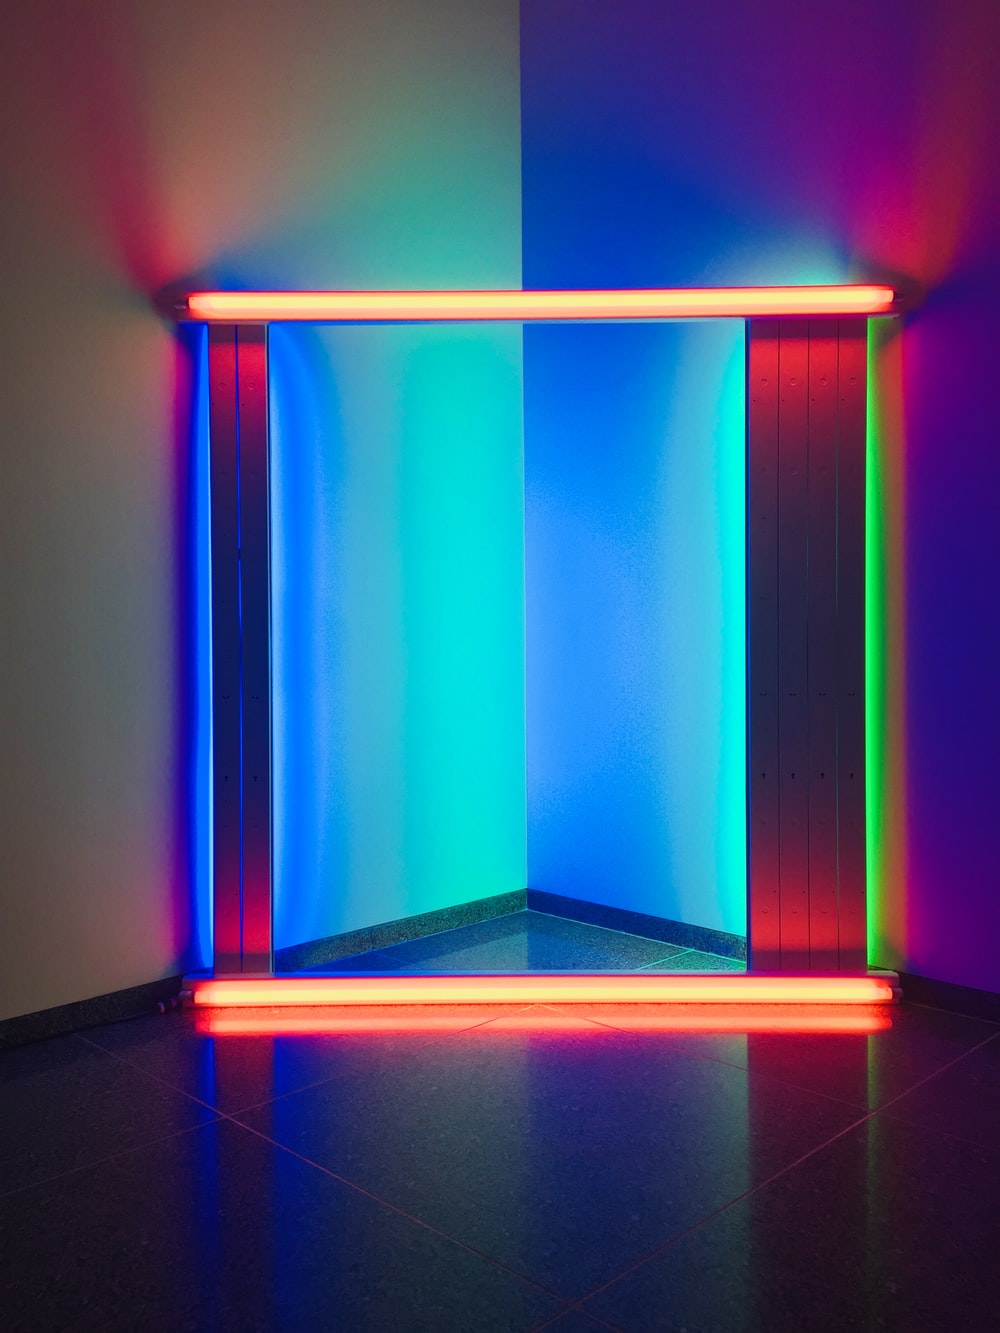 orange, red, green and blue LED light